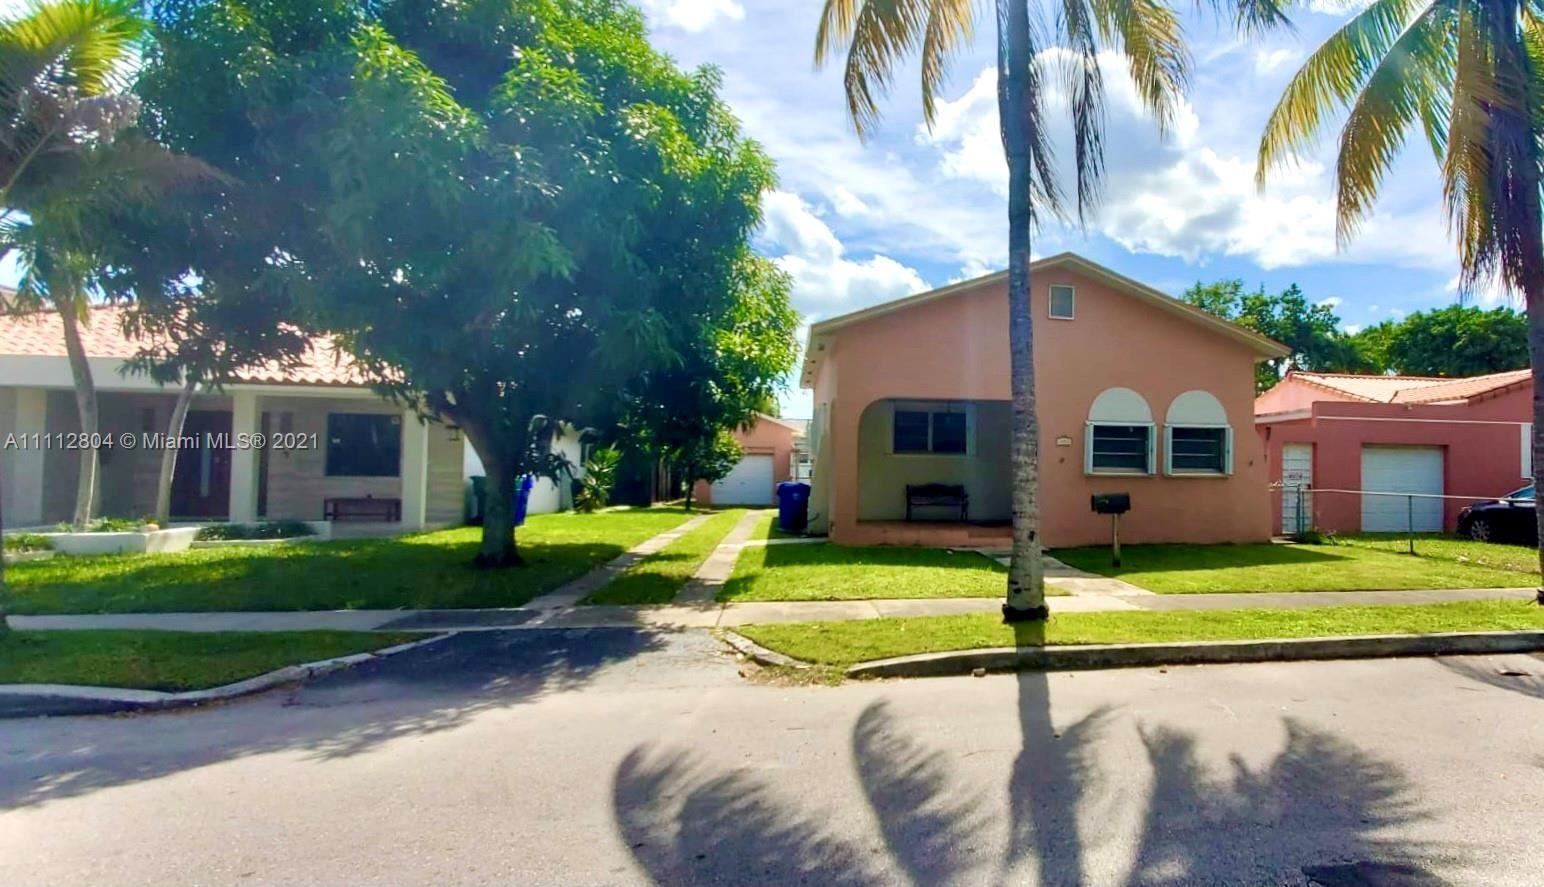 Photo of 1852 SW 15th St, Miami, FL 33145 (MLS # A11112804)